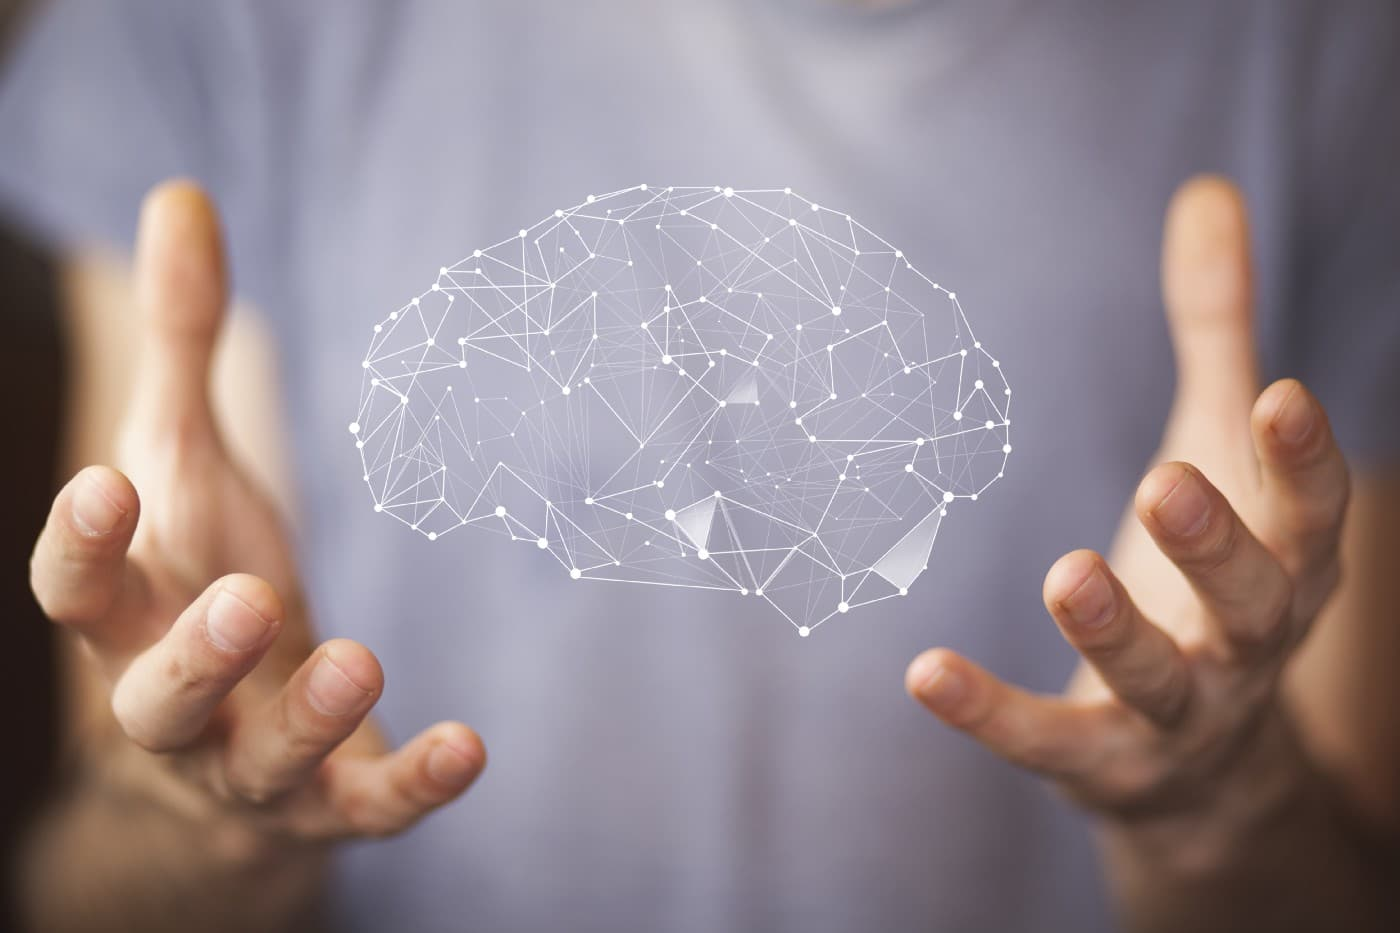 Image neurolearning